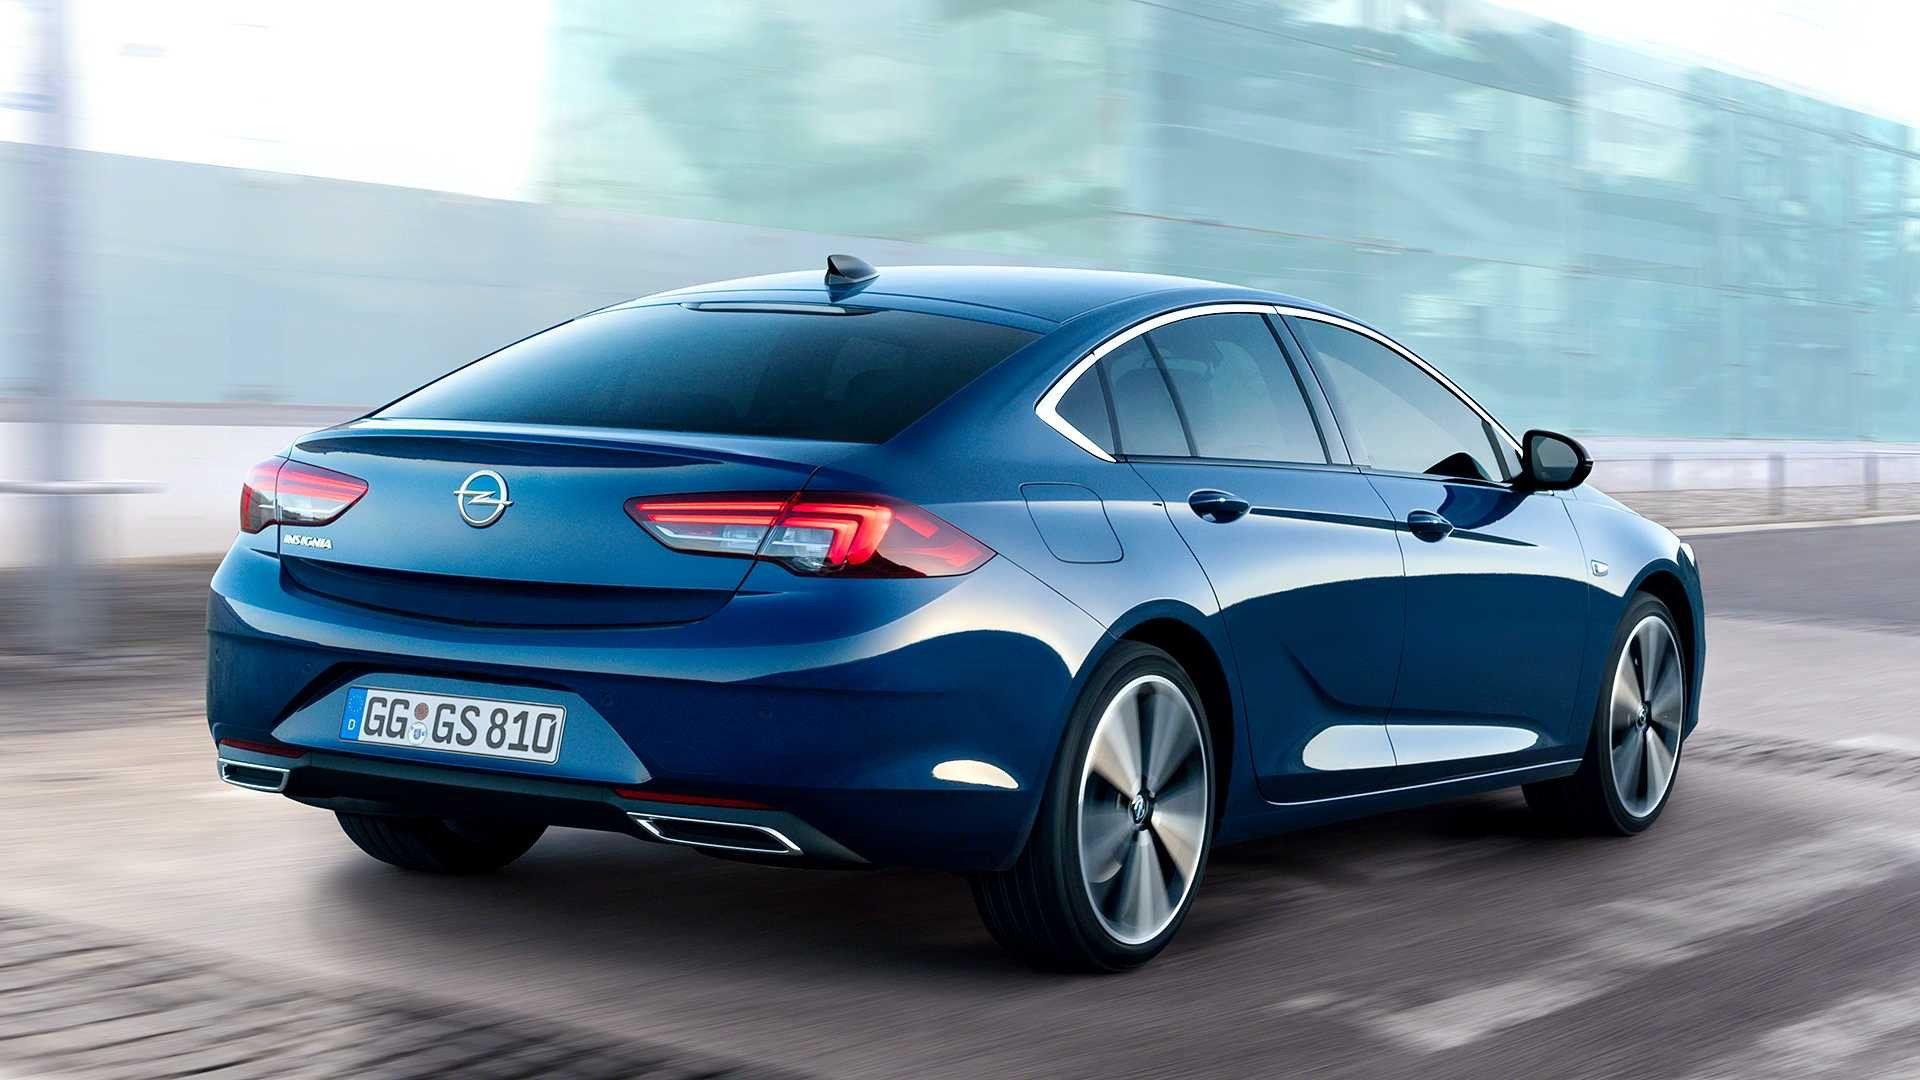 Yeni Opel Insignia 2020 First Drive Di 2020 Mobil Teknologi Teknik